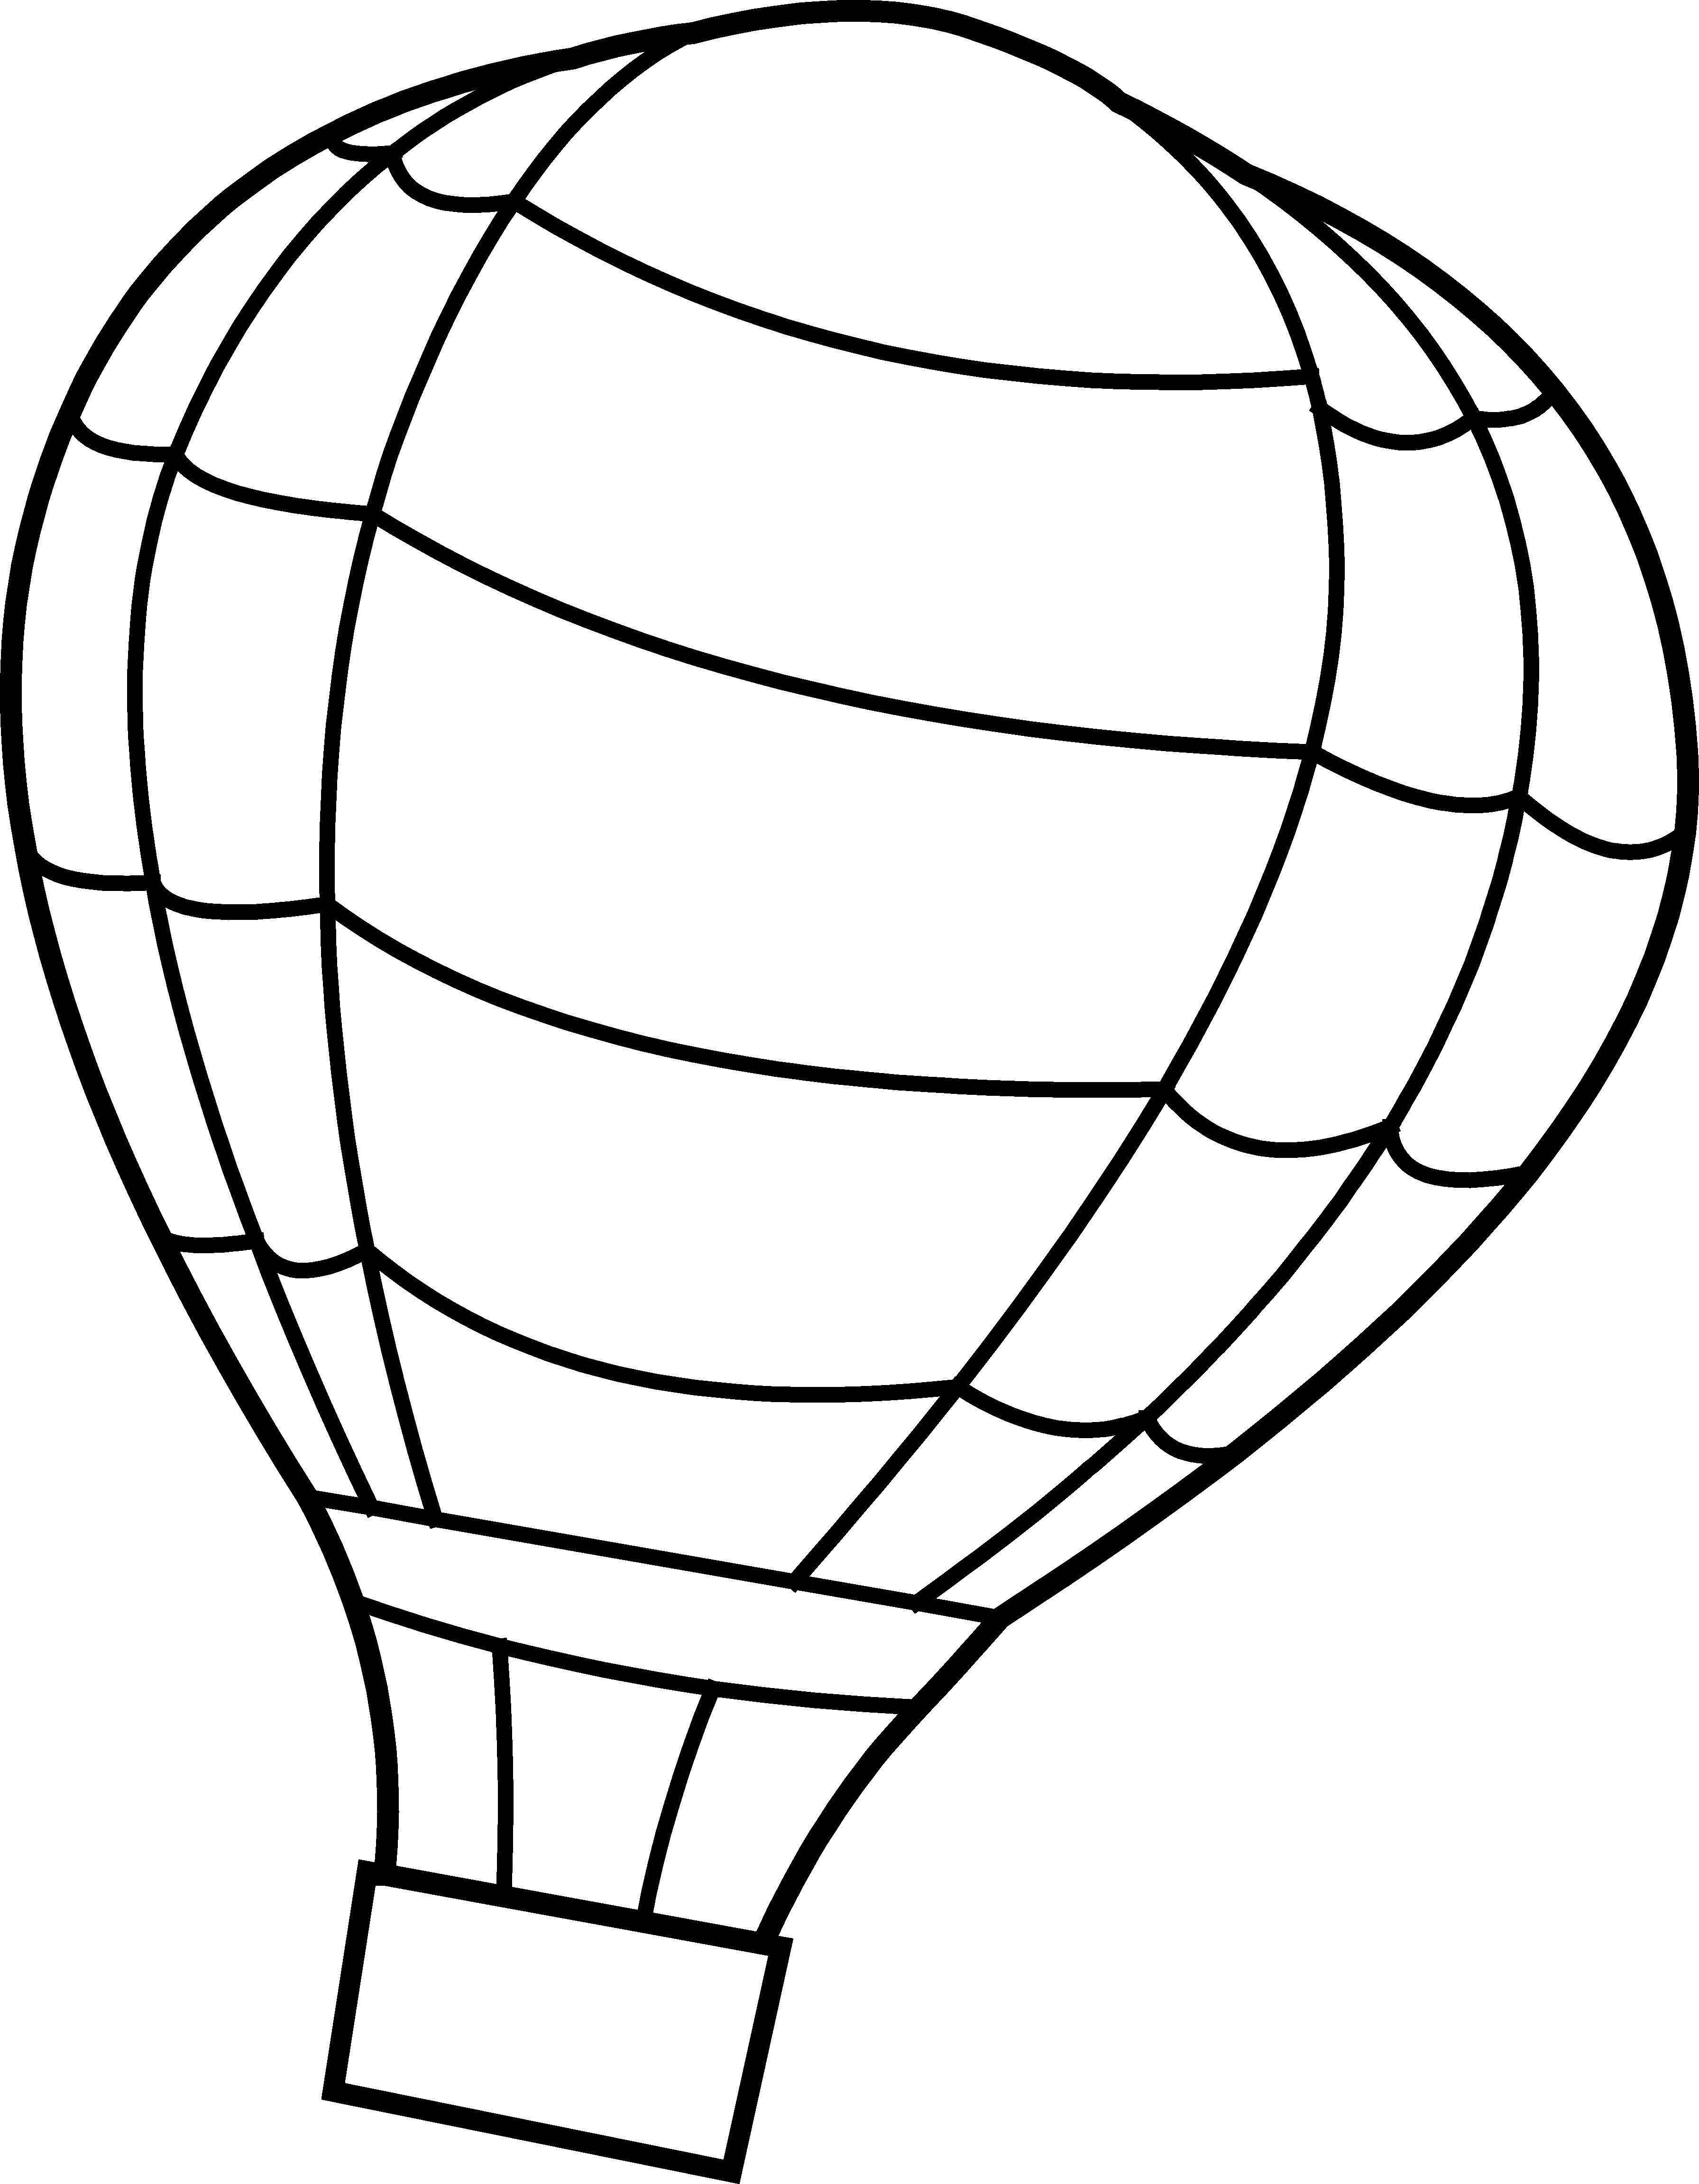 3583x4606 Baby Balloon Template, Hot Air Balloon